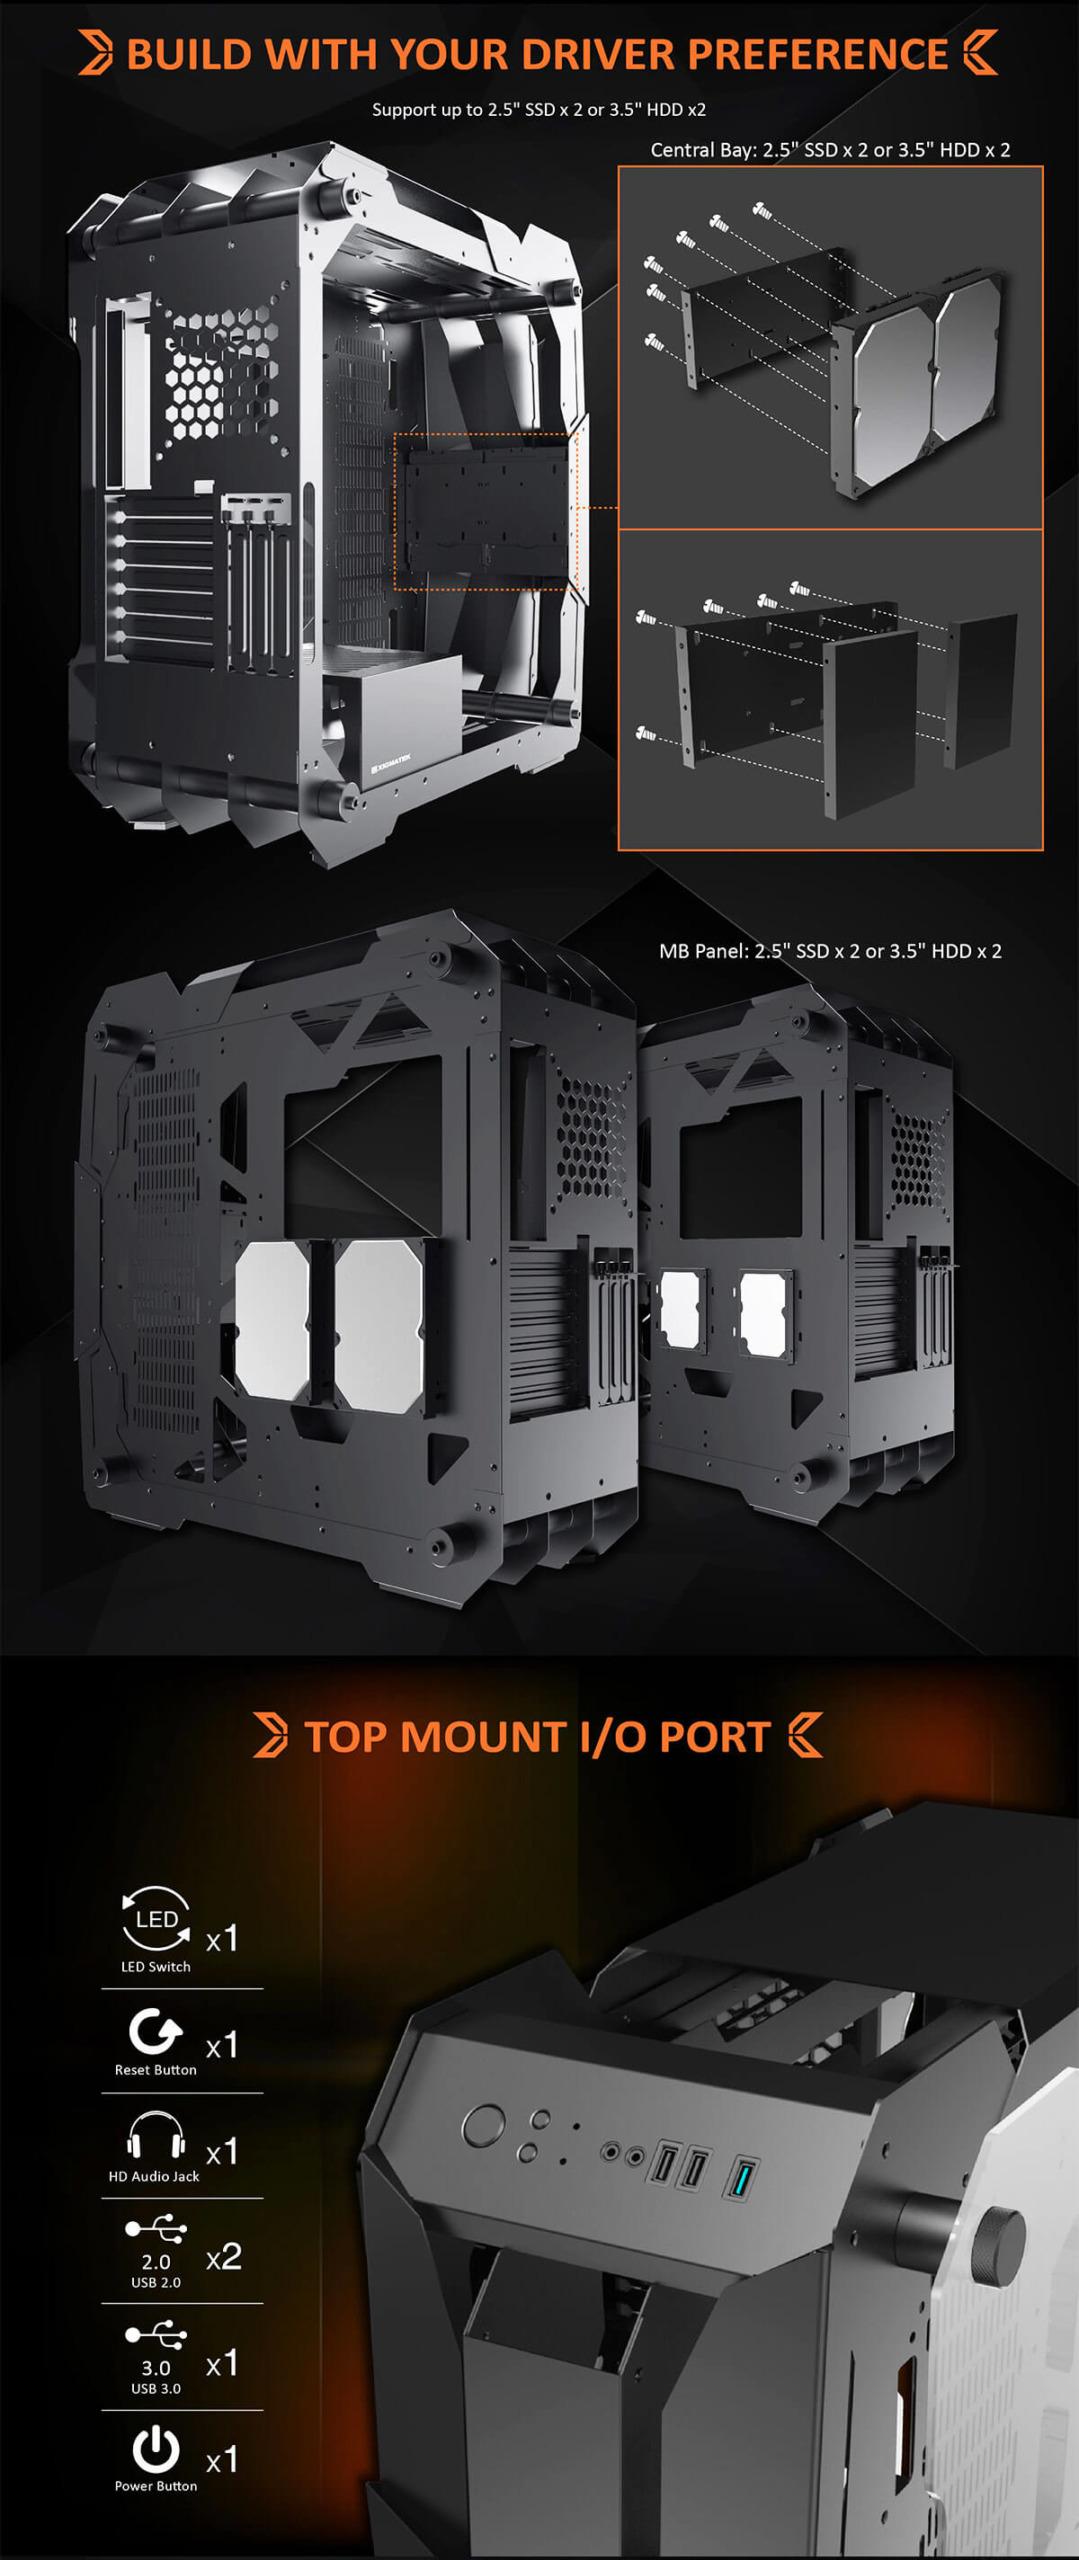 Case Xigmatek X7 Super Tower Black Features 4